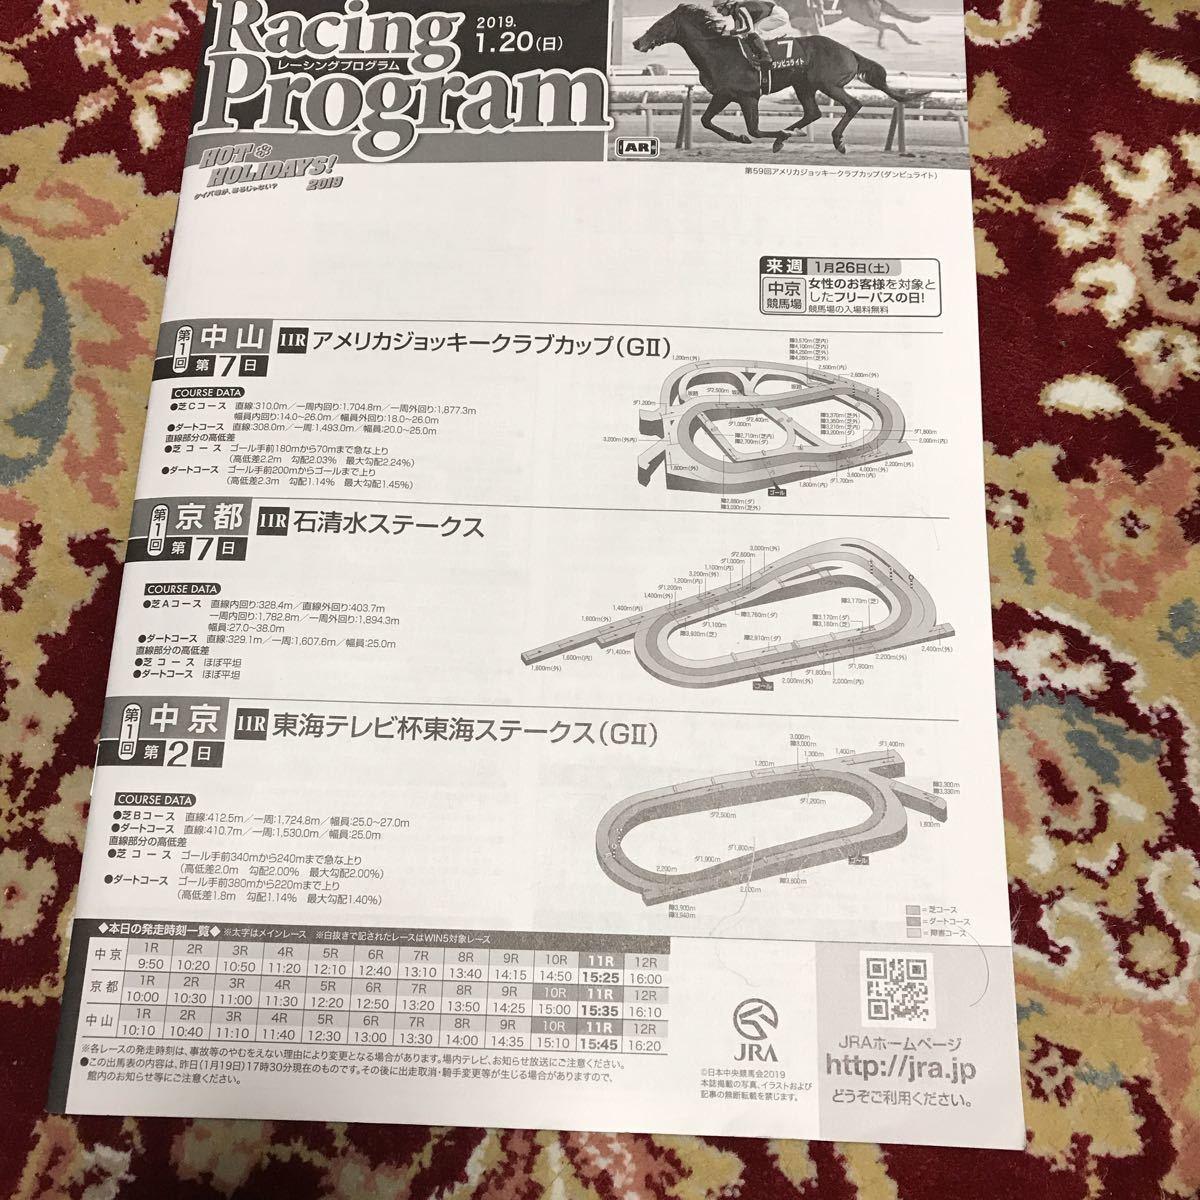 JRAレーシングプログラム2019.1.20(日)、AJCC杯(GⅡ)、東海ステークス(GⅡ)、石清水ステークス_画像1